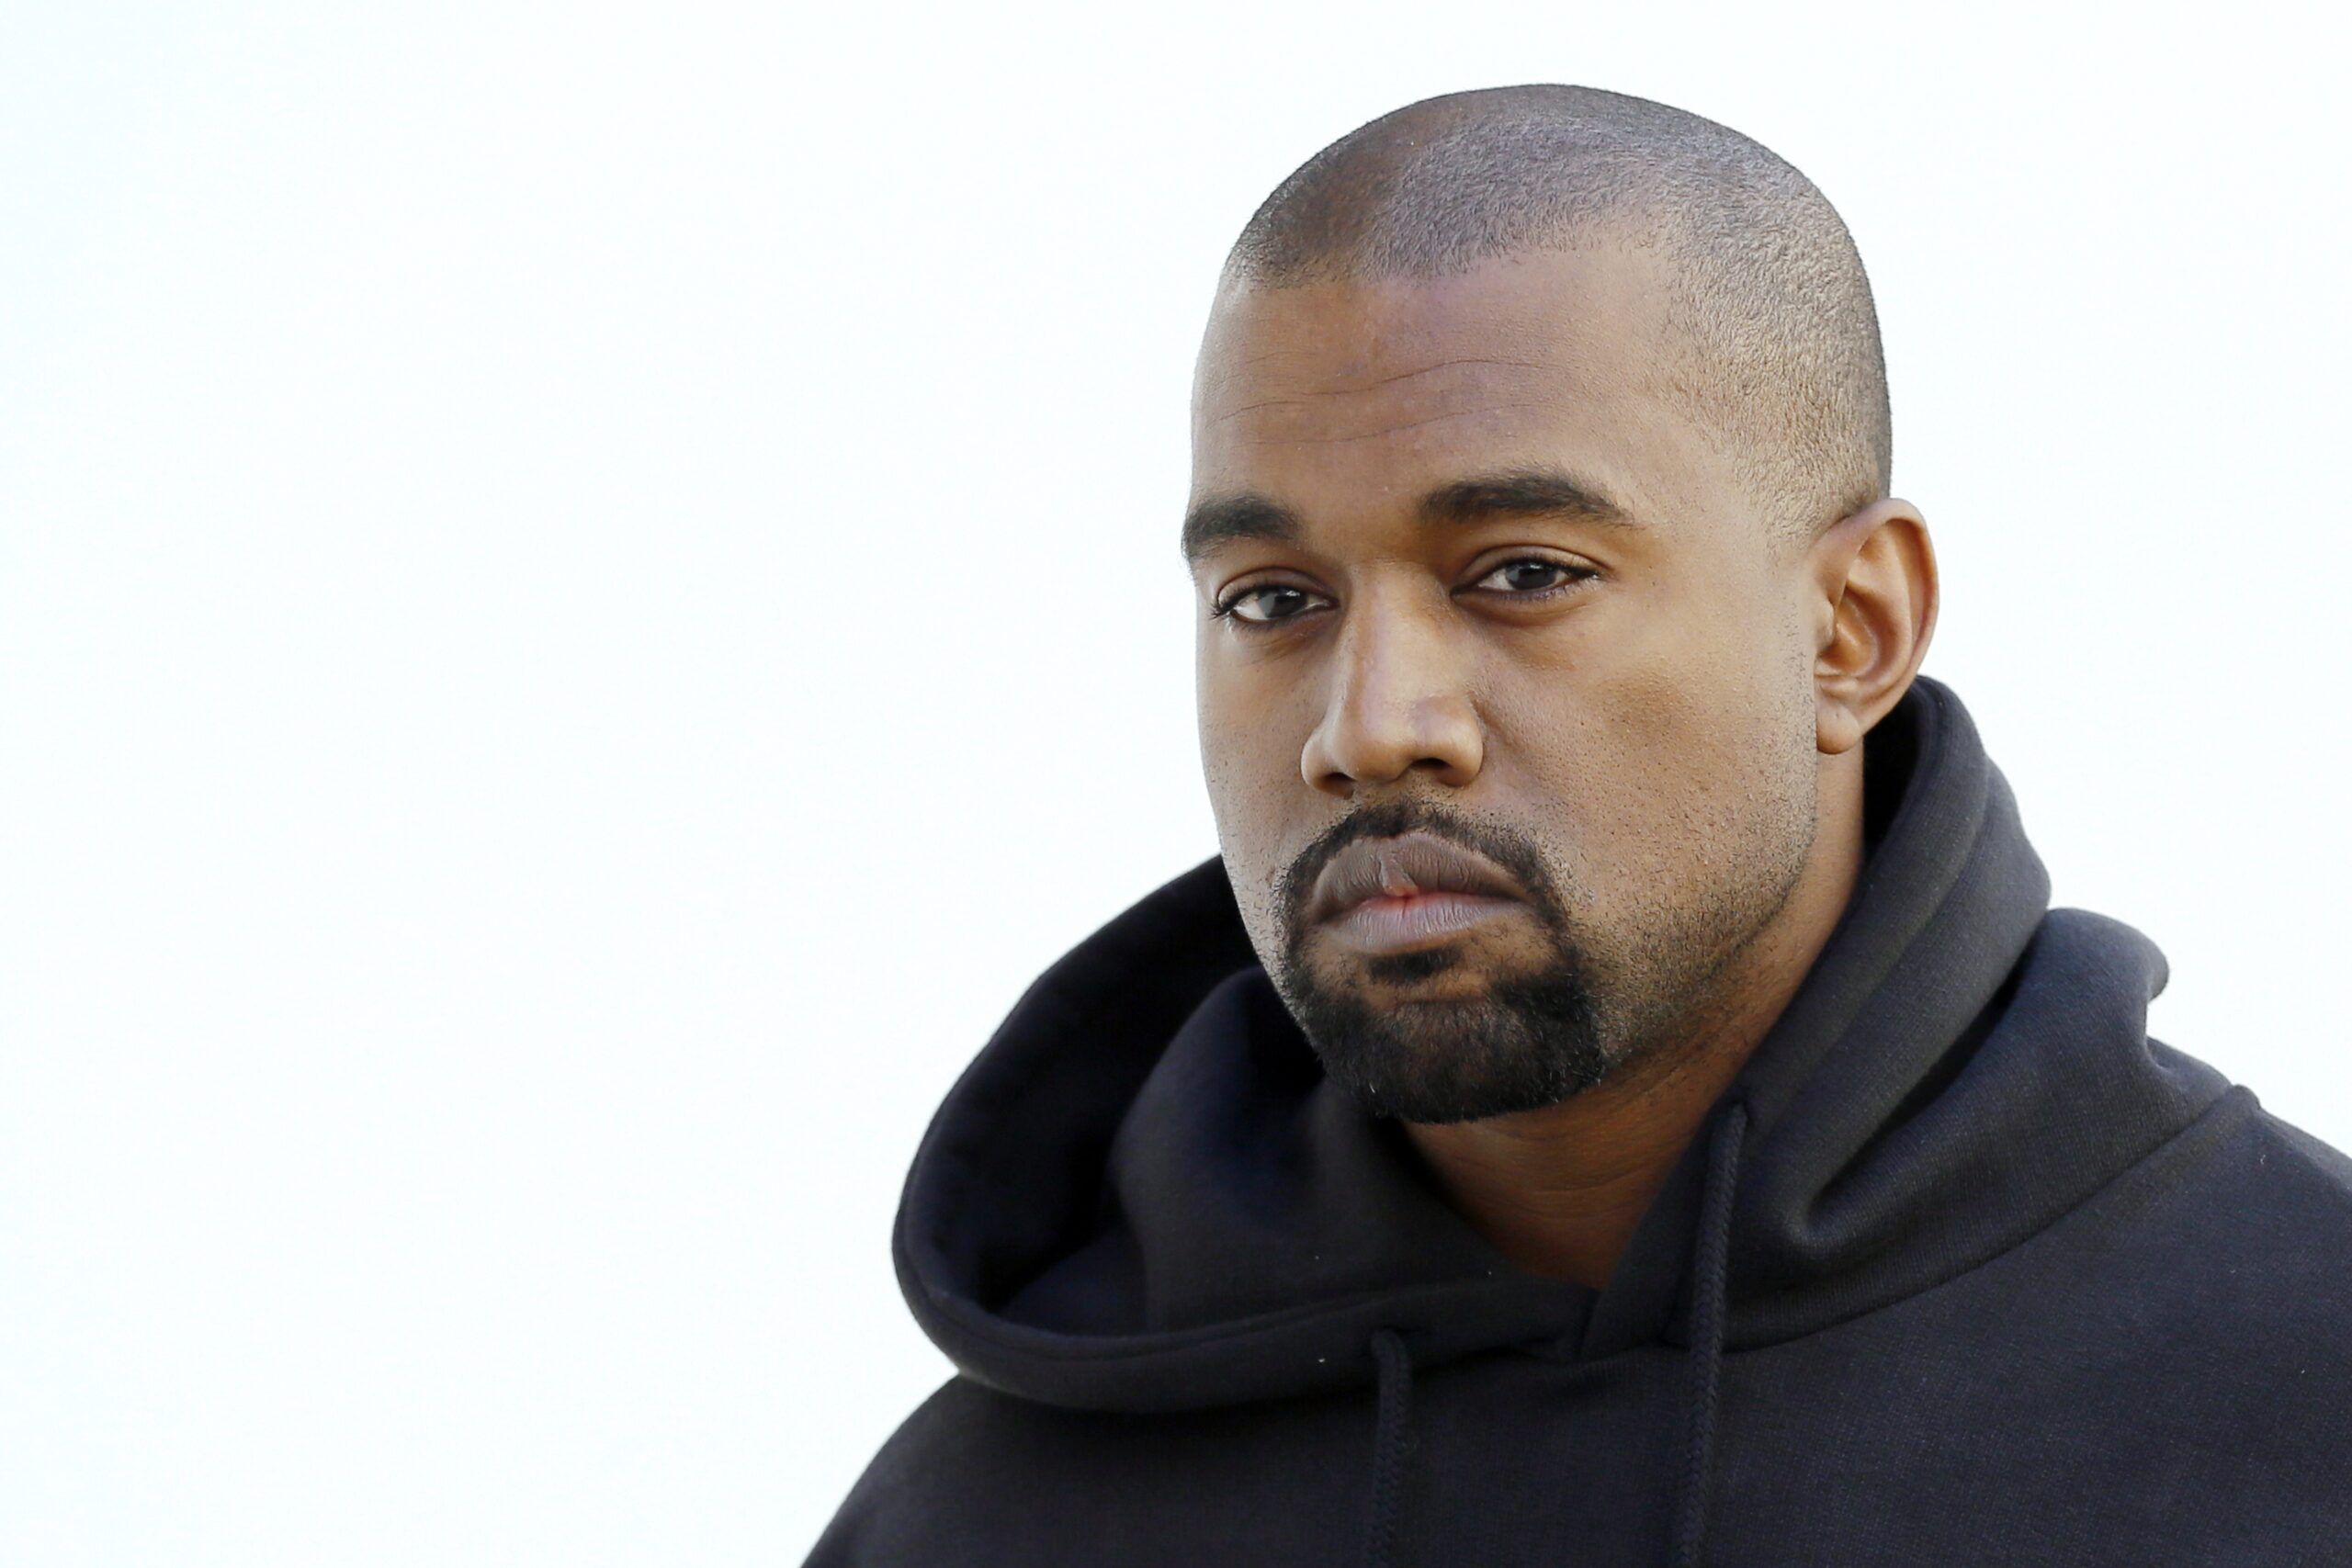 Gap Stock Soars After Kanye West Reveals YEEZY Partnership